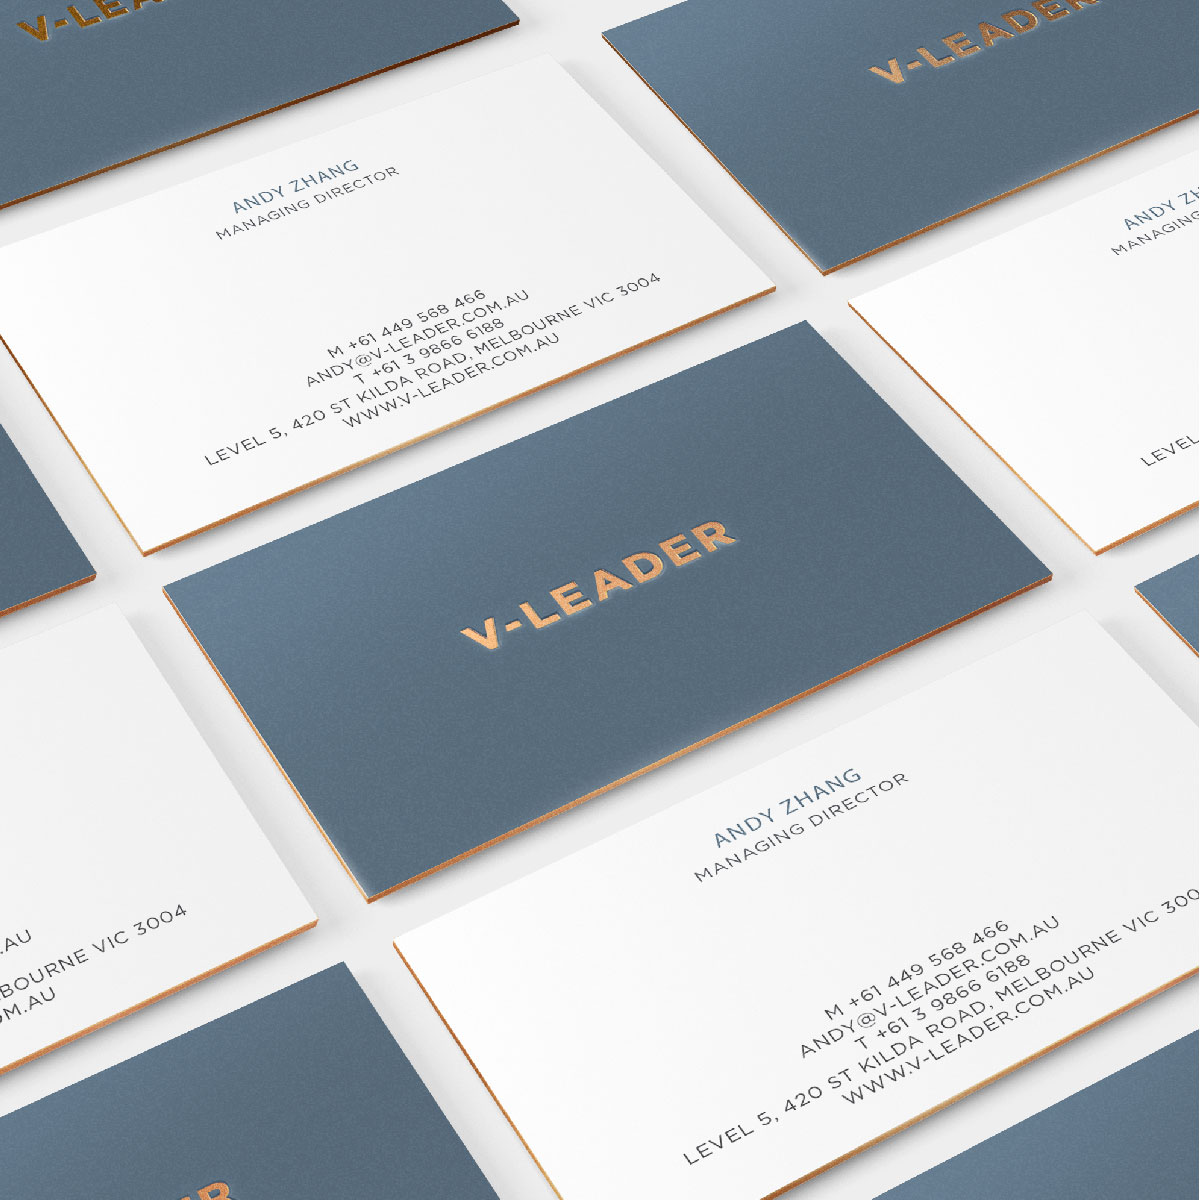 V-Leader Digital Website Development